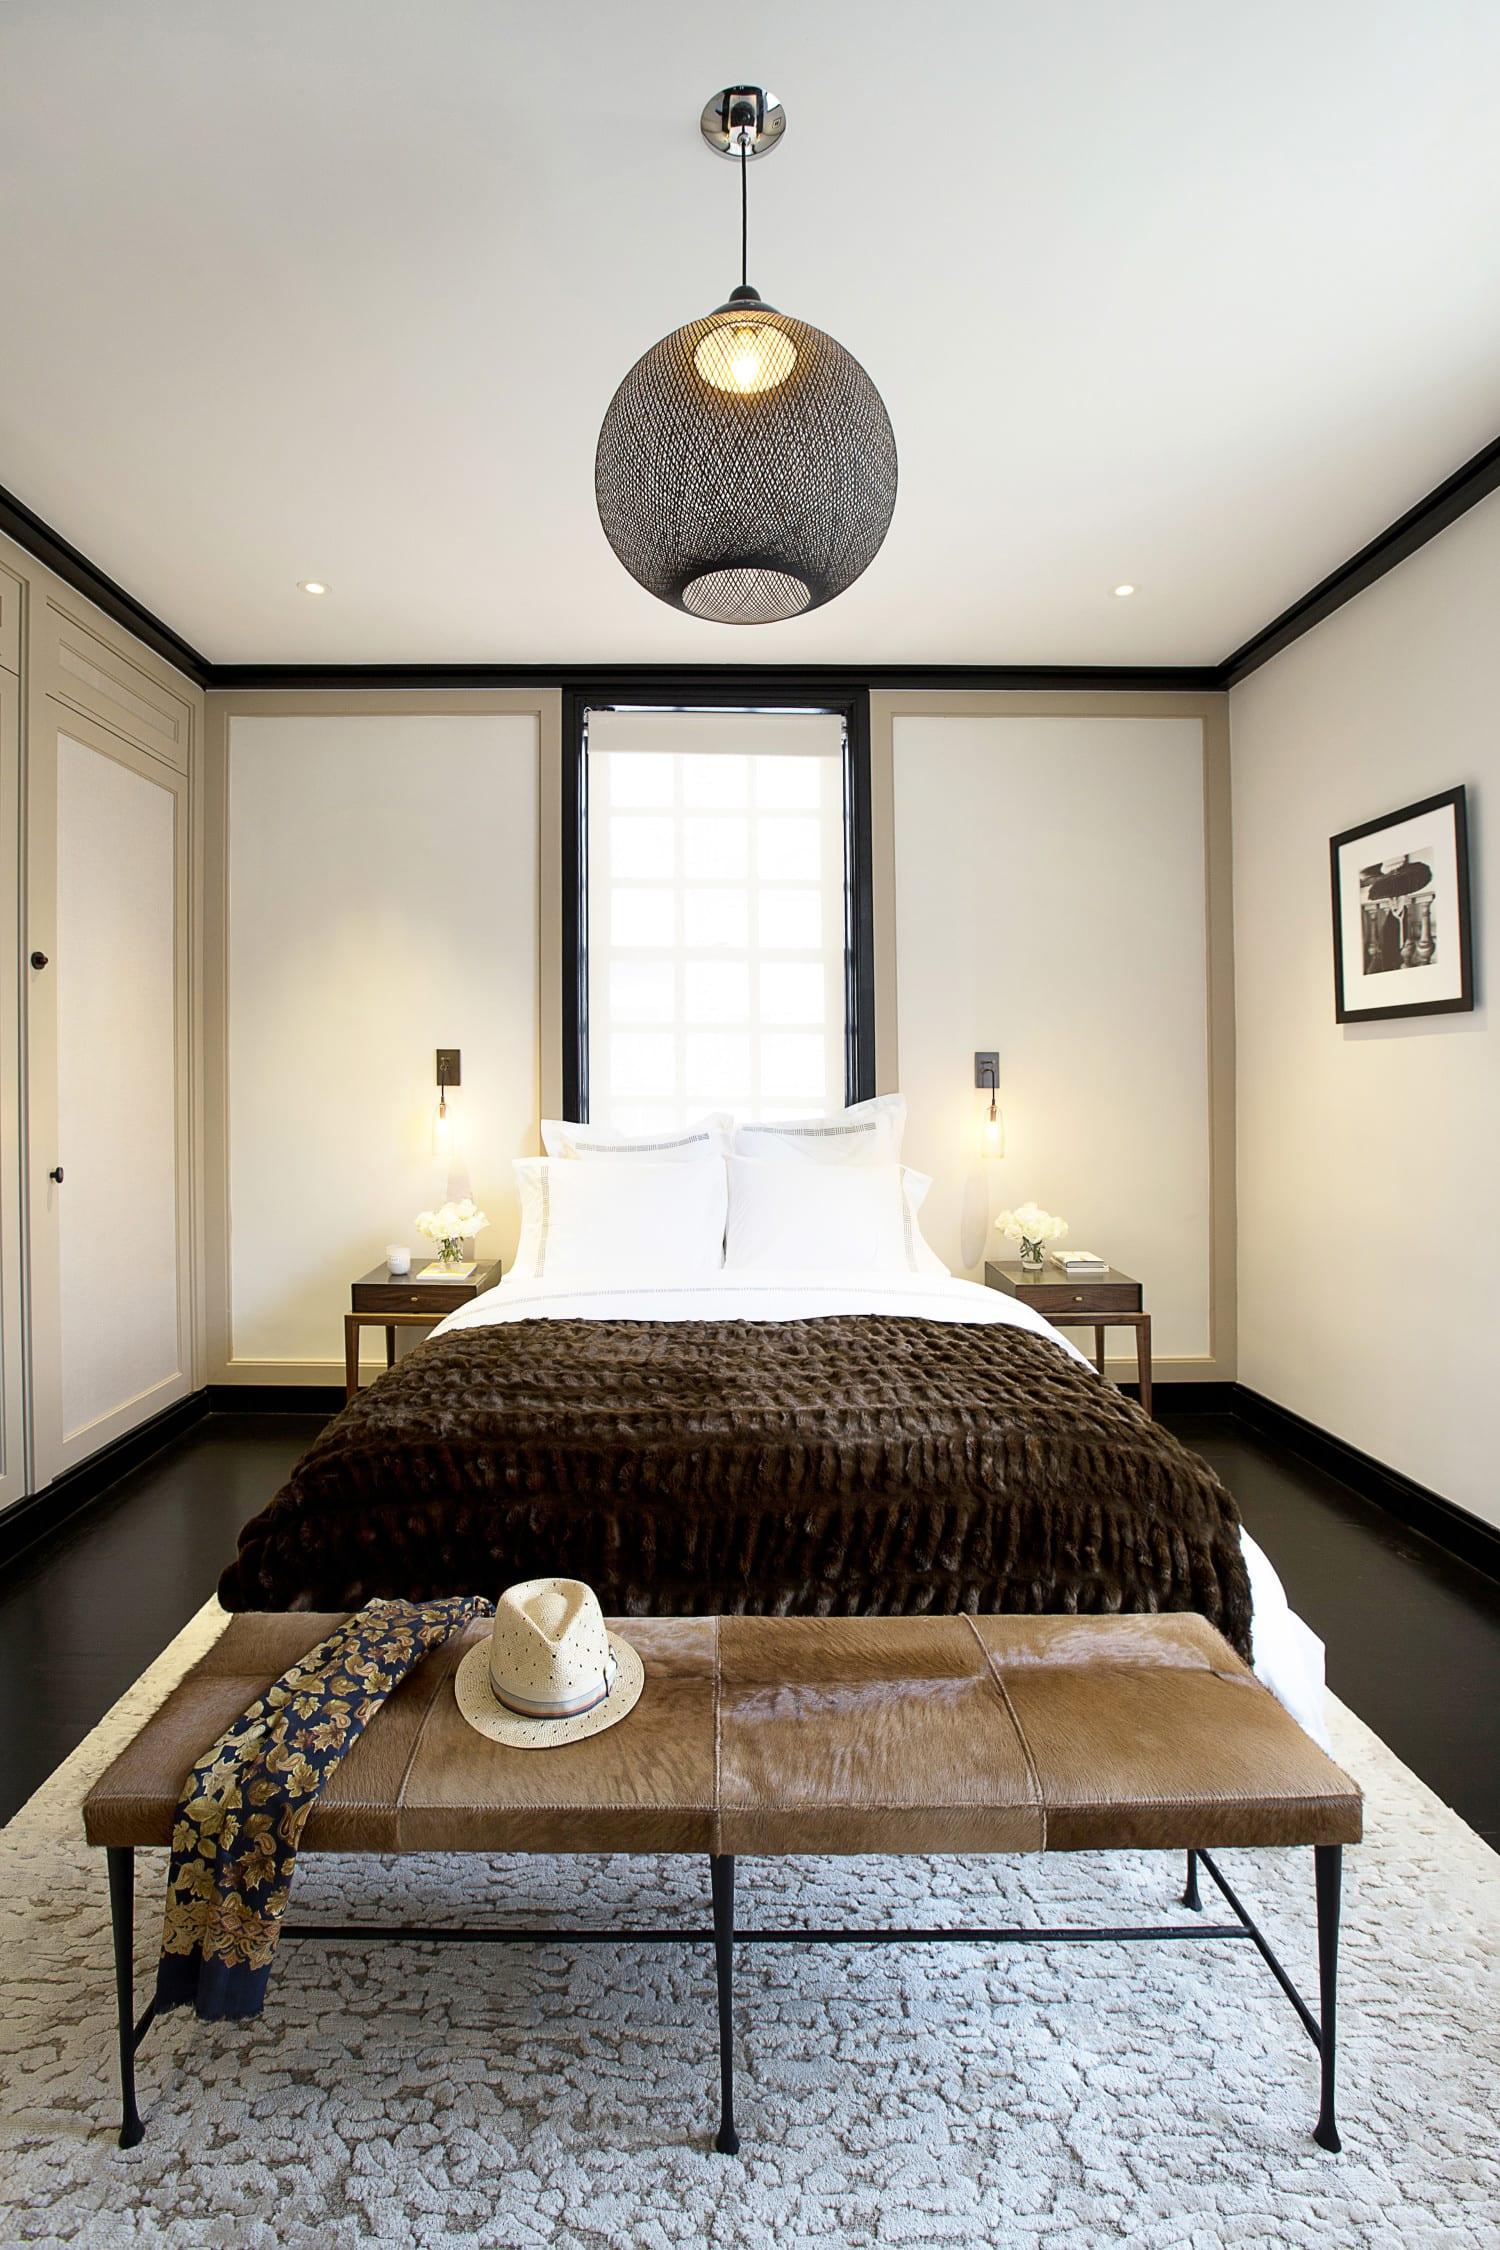 Interior Design by Scarpidis Design seen at West Village Penthouse, New York - Interior Design